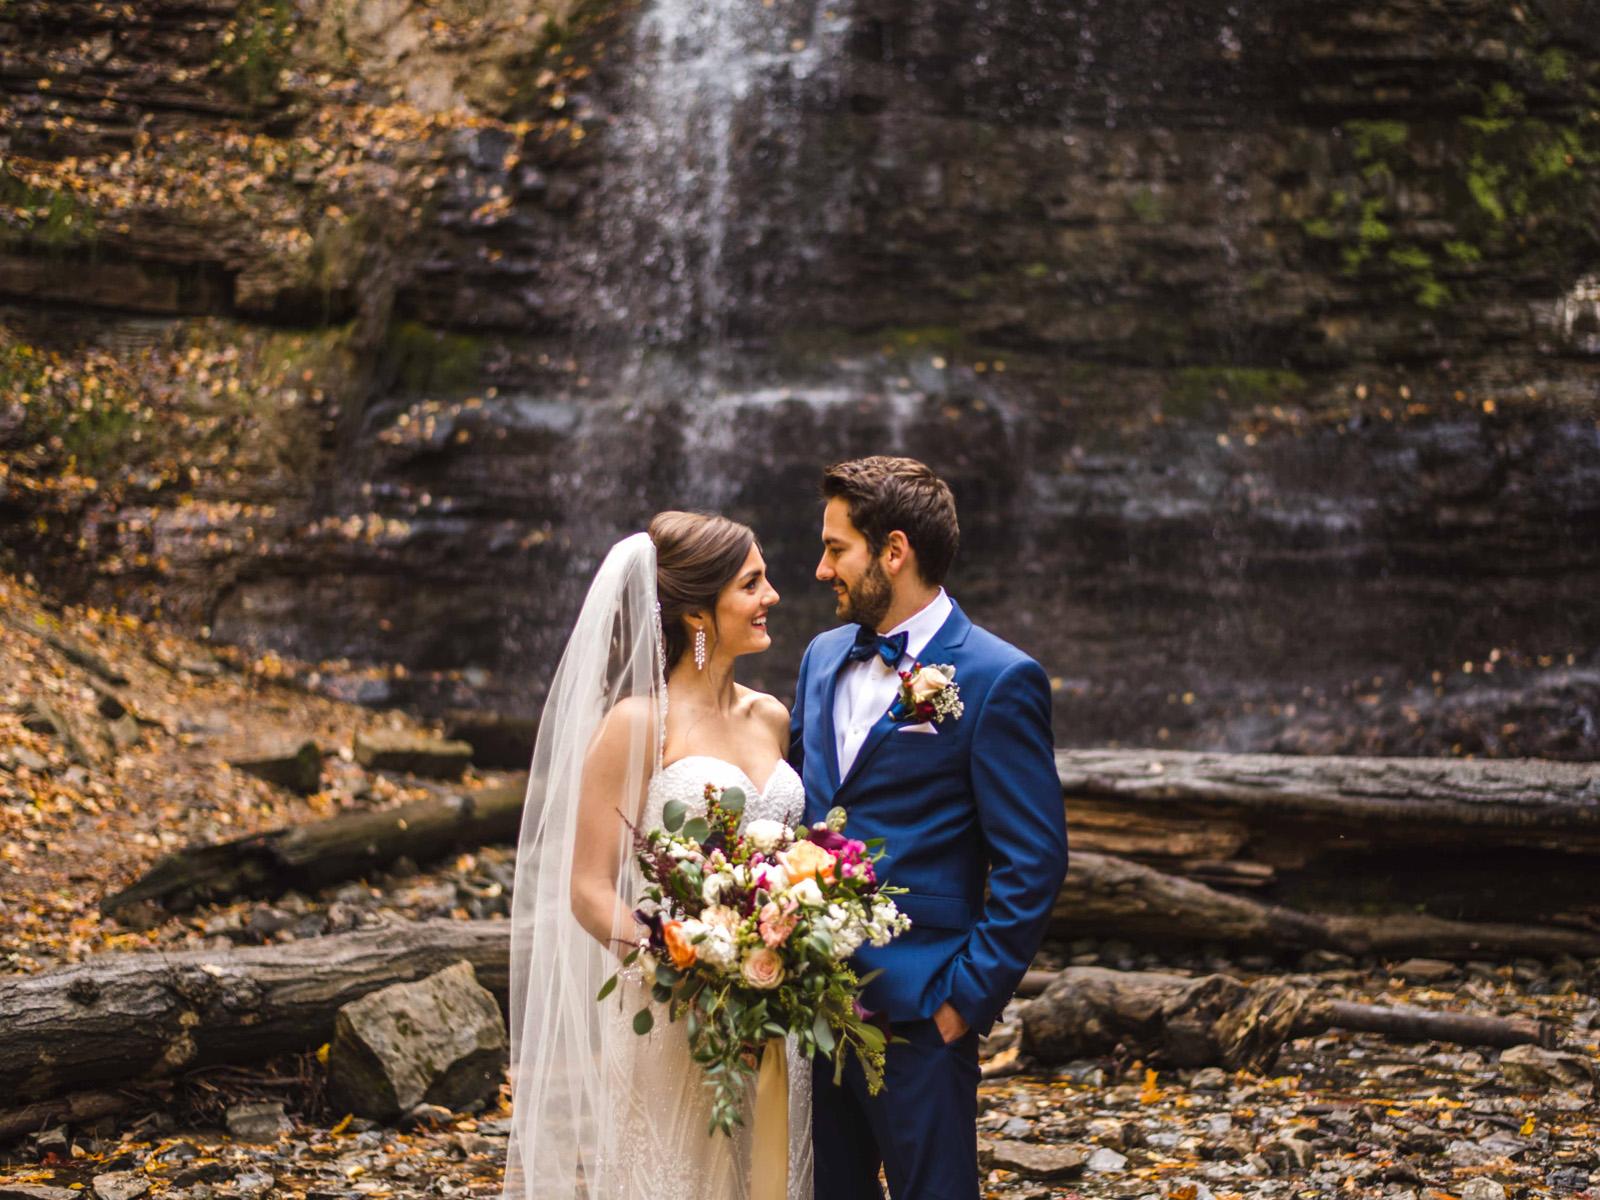 Chris & Heather's Wedding